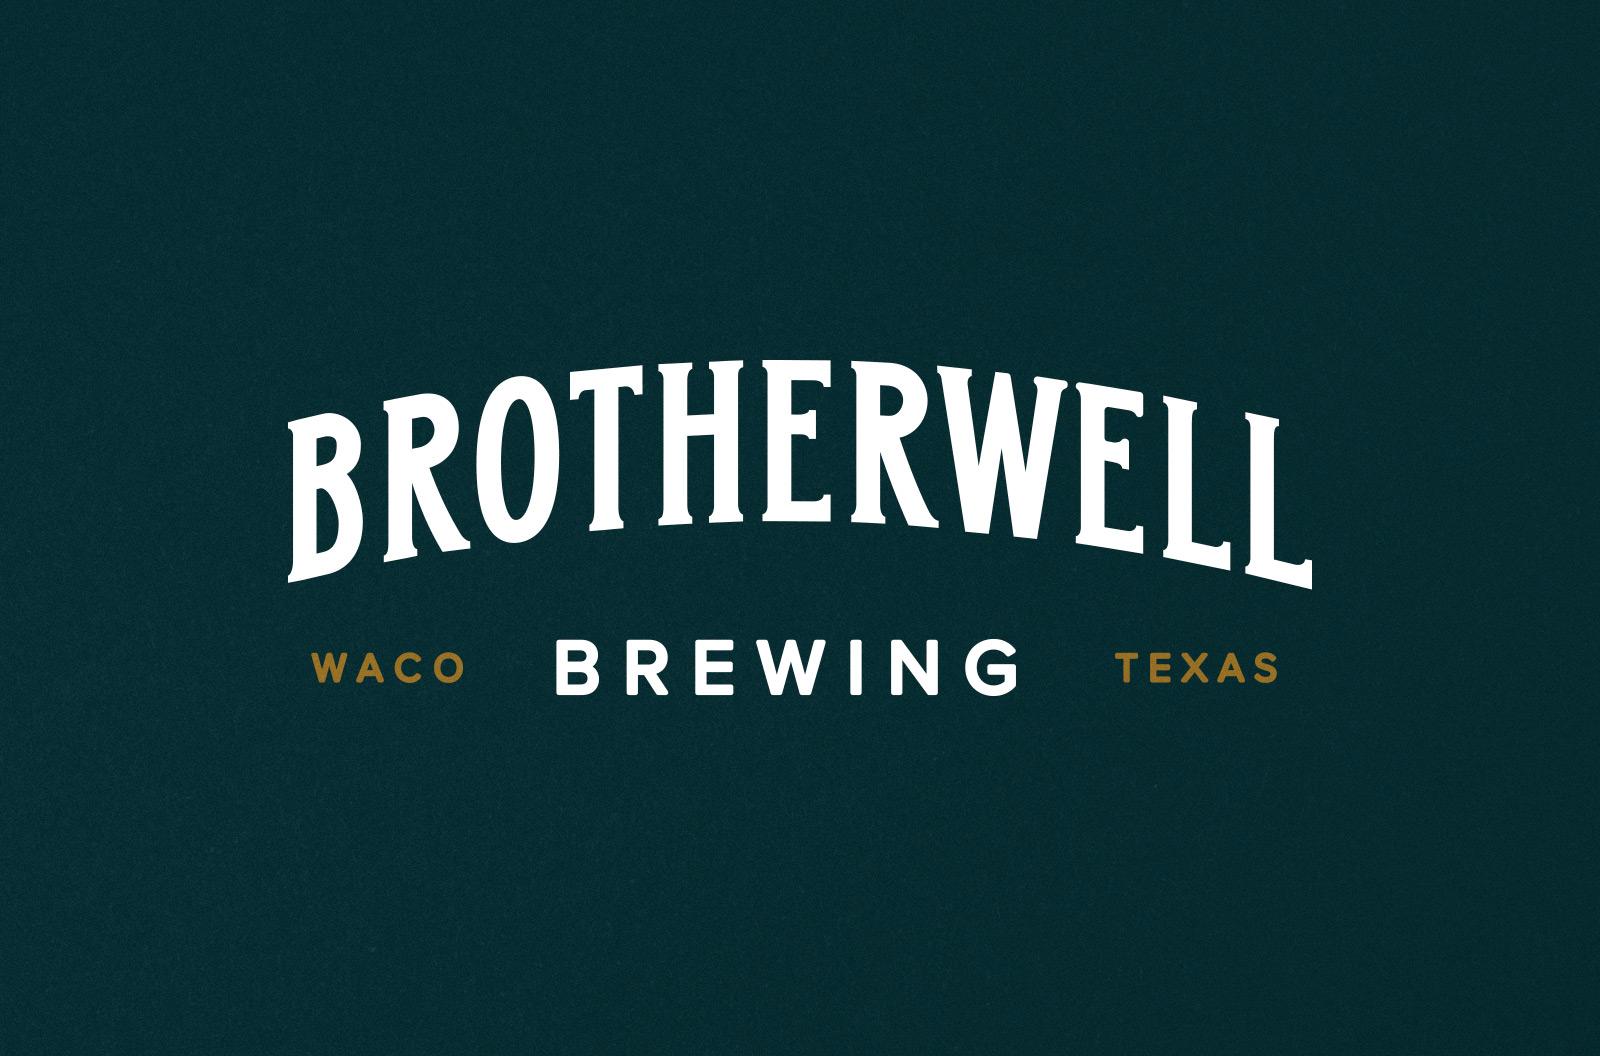 Brotherwell_LogoType_1.jpg